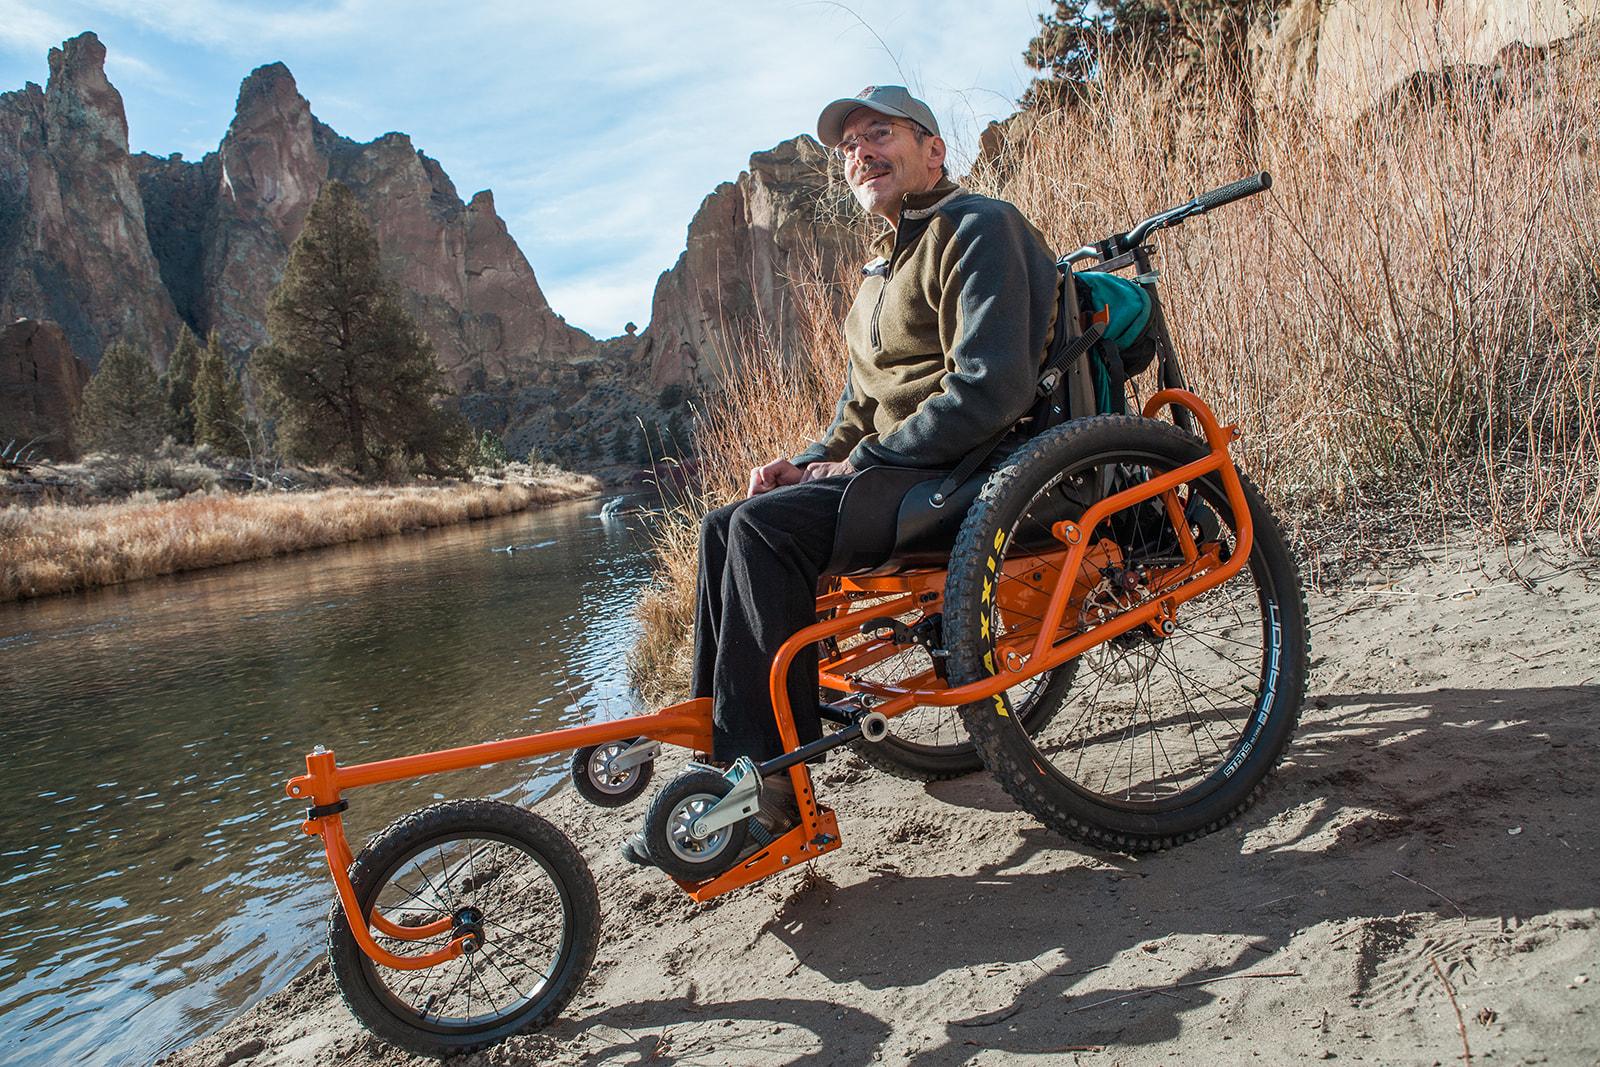 AdvenChair-offroad-wheelchair-Bend-Oregon-164.jpg